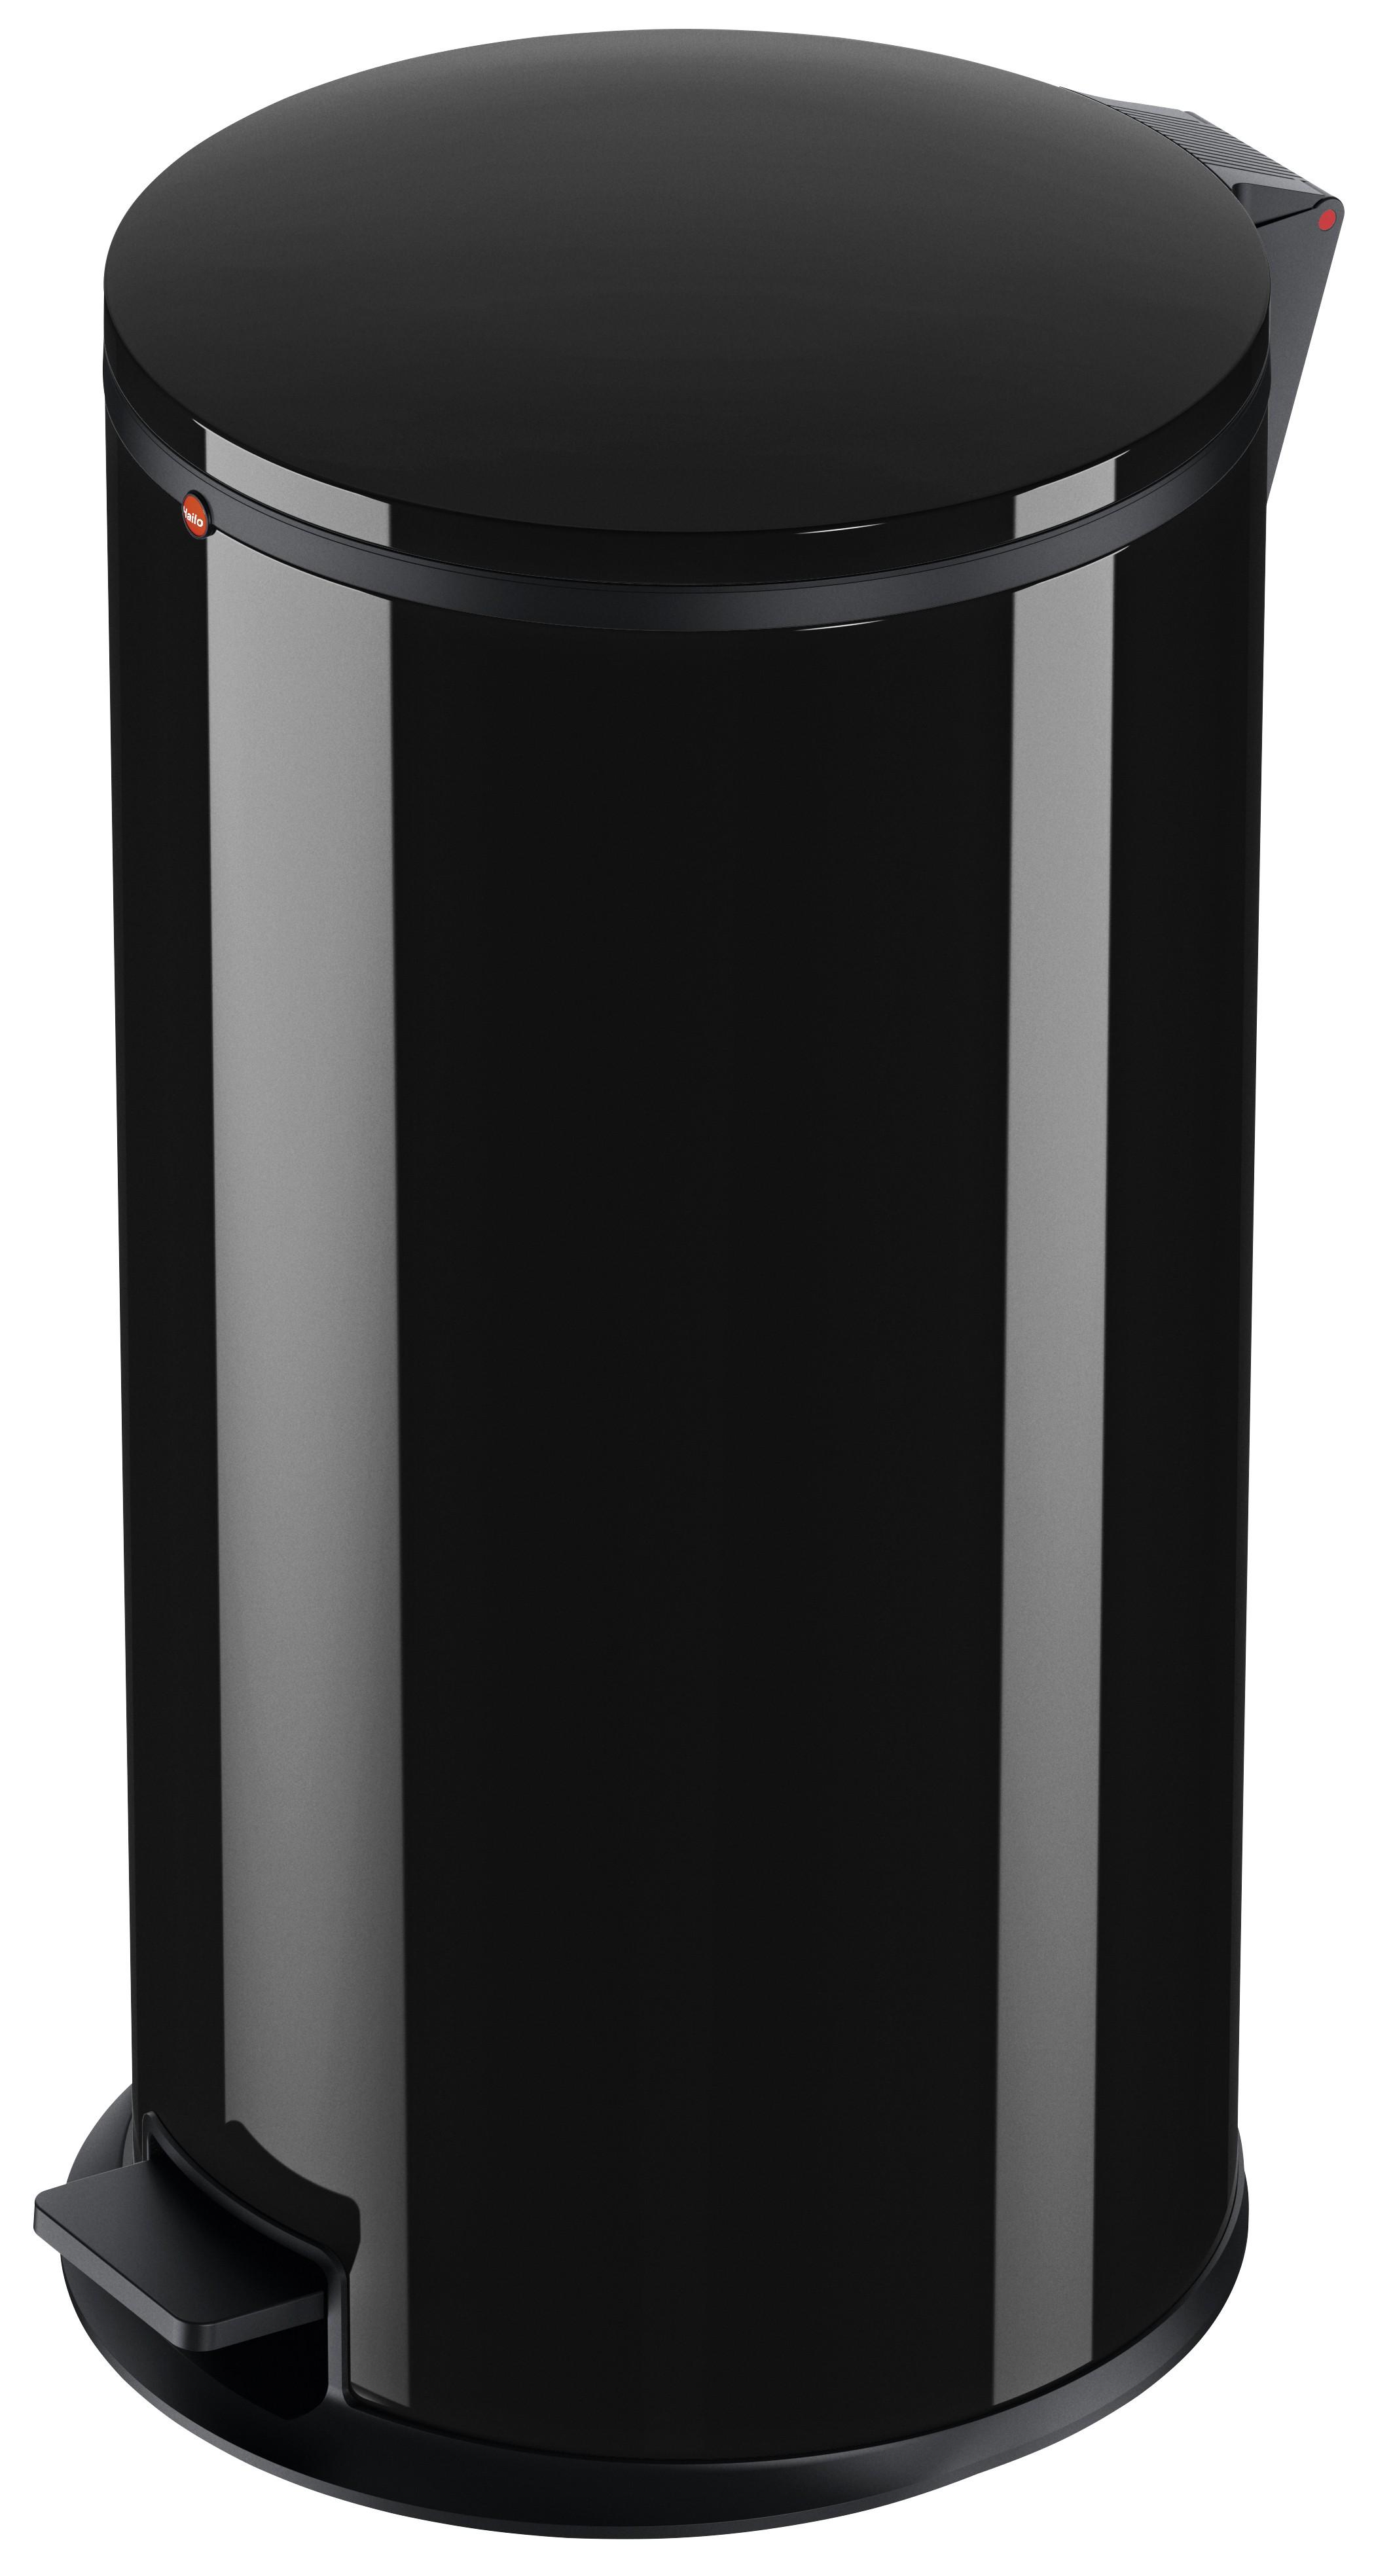 Hailo Pure XL, Stahlblech schwarz , 44 Liter, Inneneimer: verzinkt, Tret-Abfallsammler